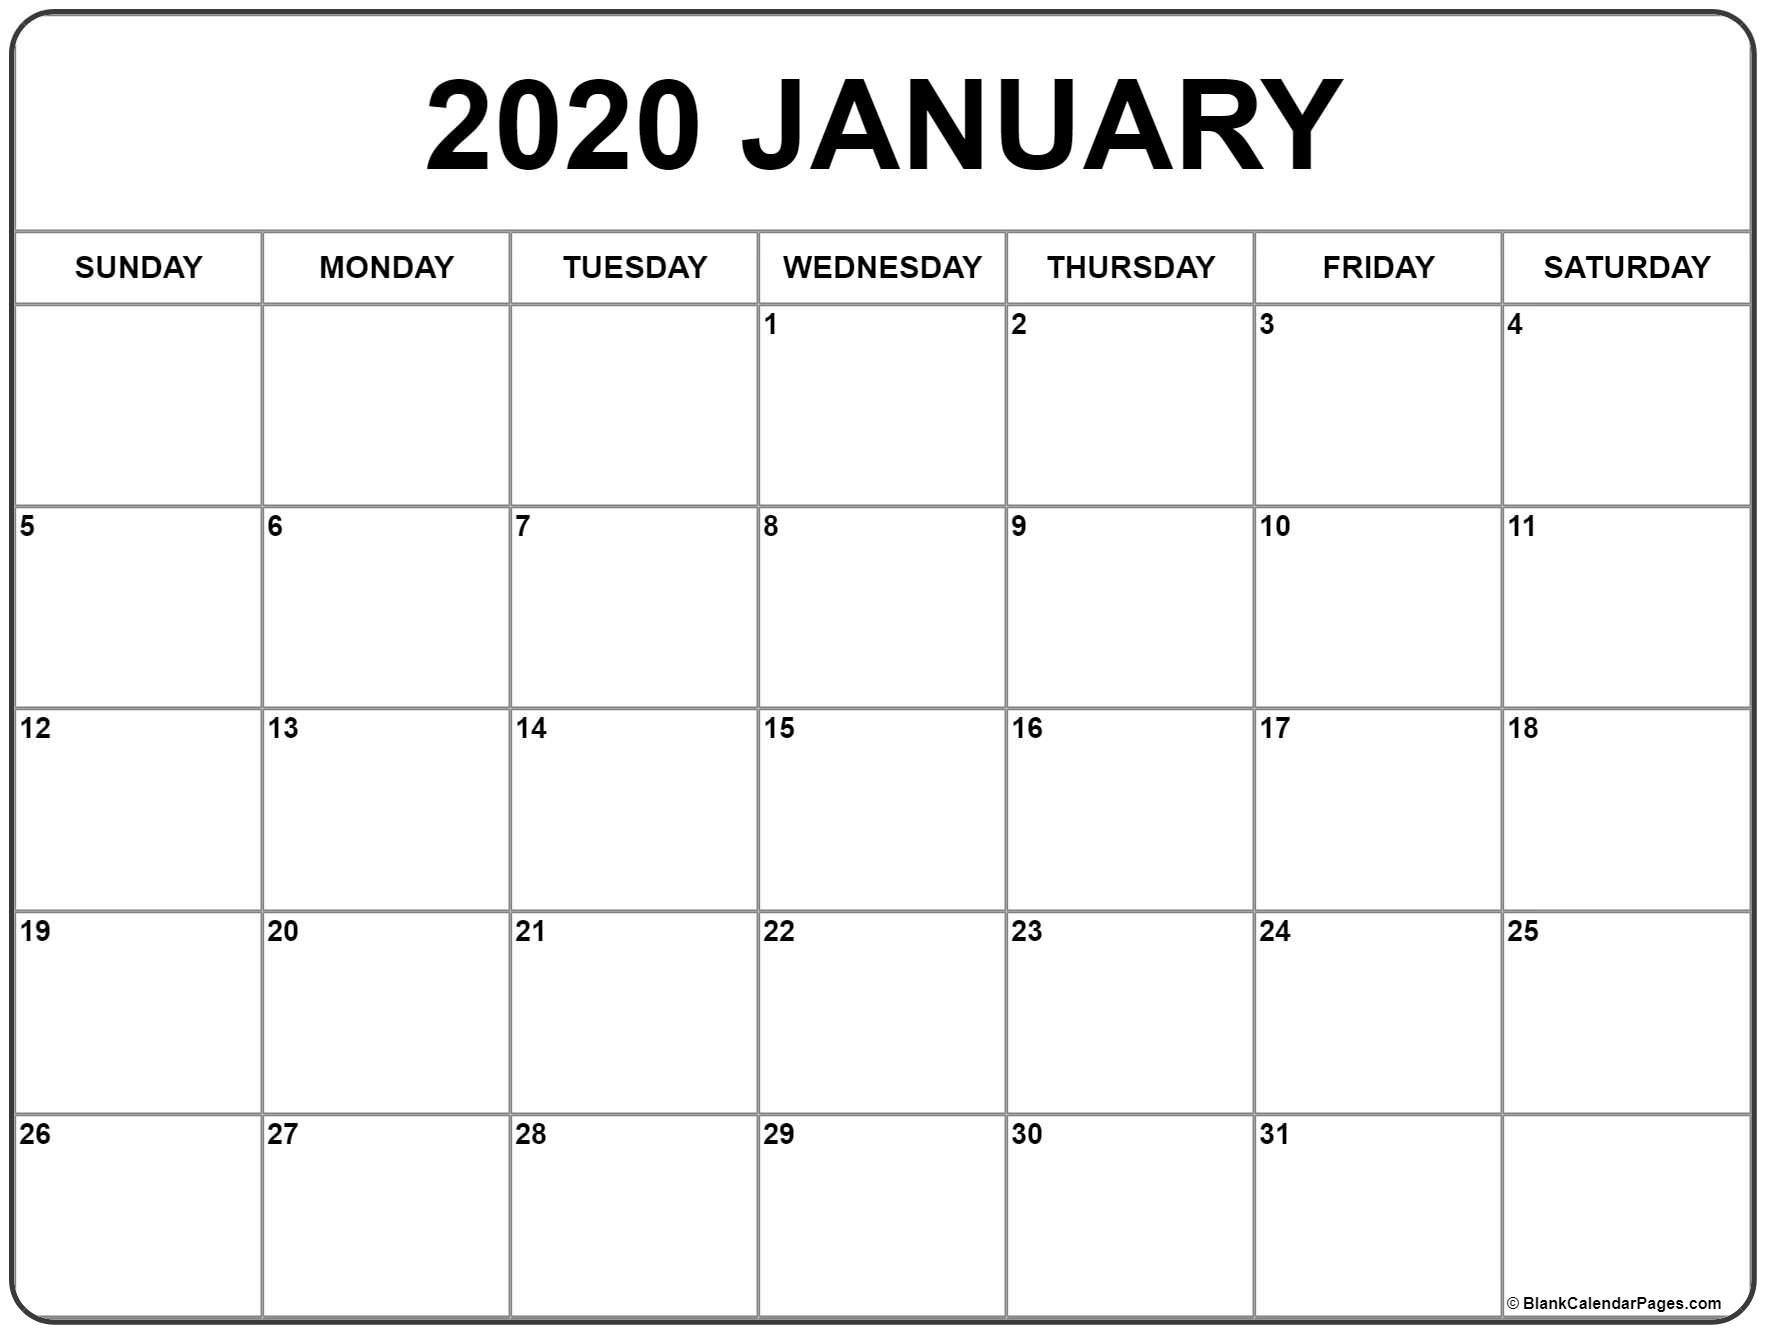 Get 8X11 Printable 2020 Calendar | Calendar Printables Free Blank within Broadcast Calendar 2019 2021 Photo